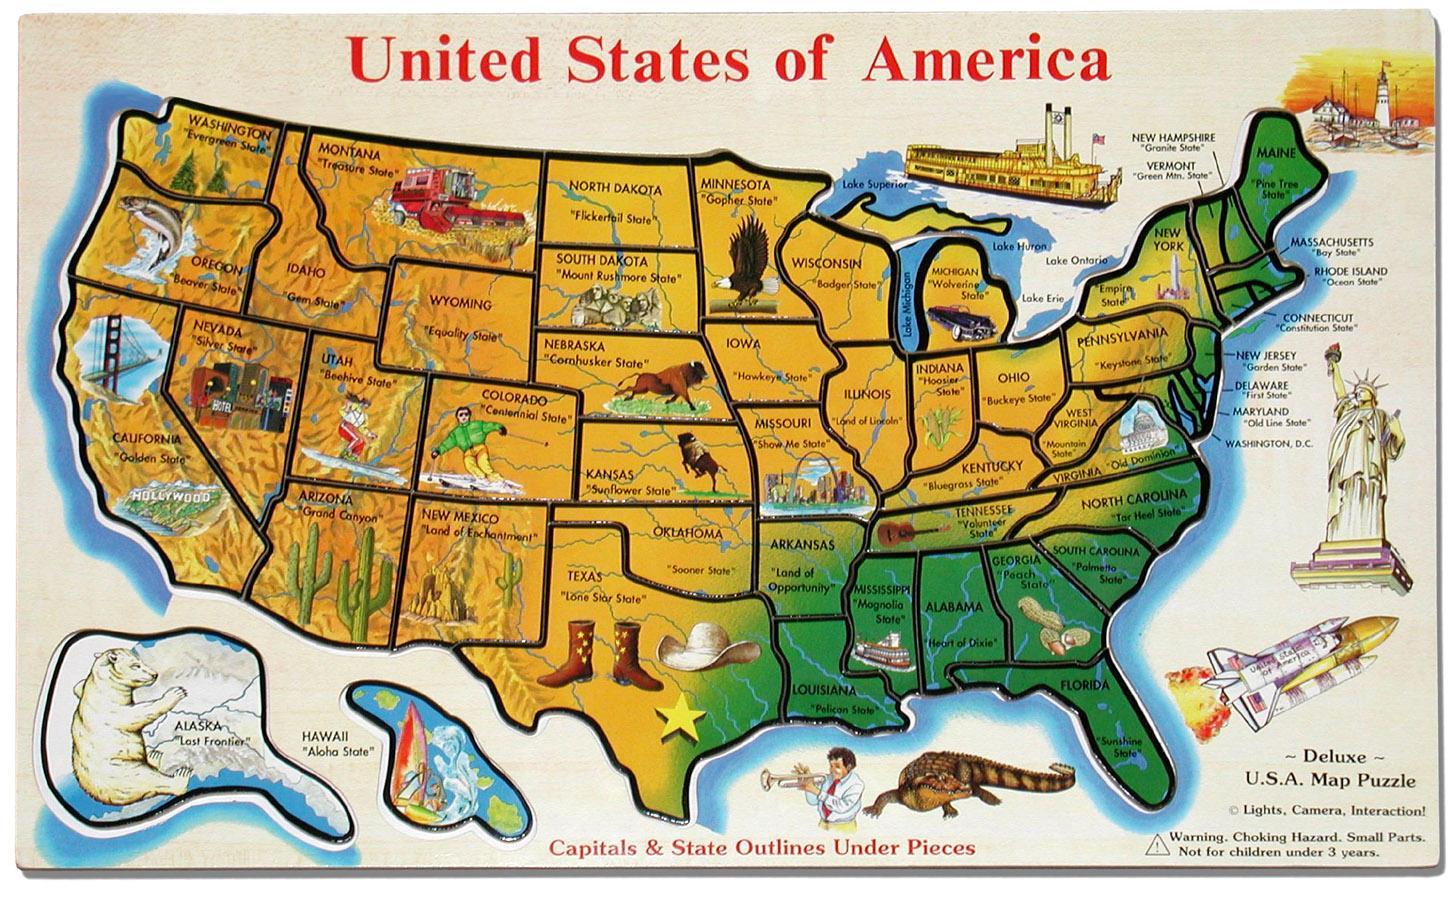 Amerika Karte Staaten.Karte Der Vereinigten Staaten Fur Kinder Vereinigte